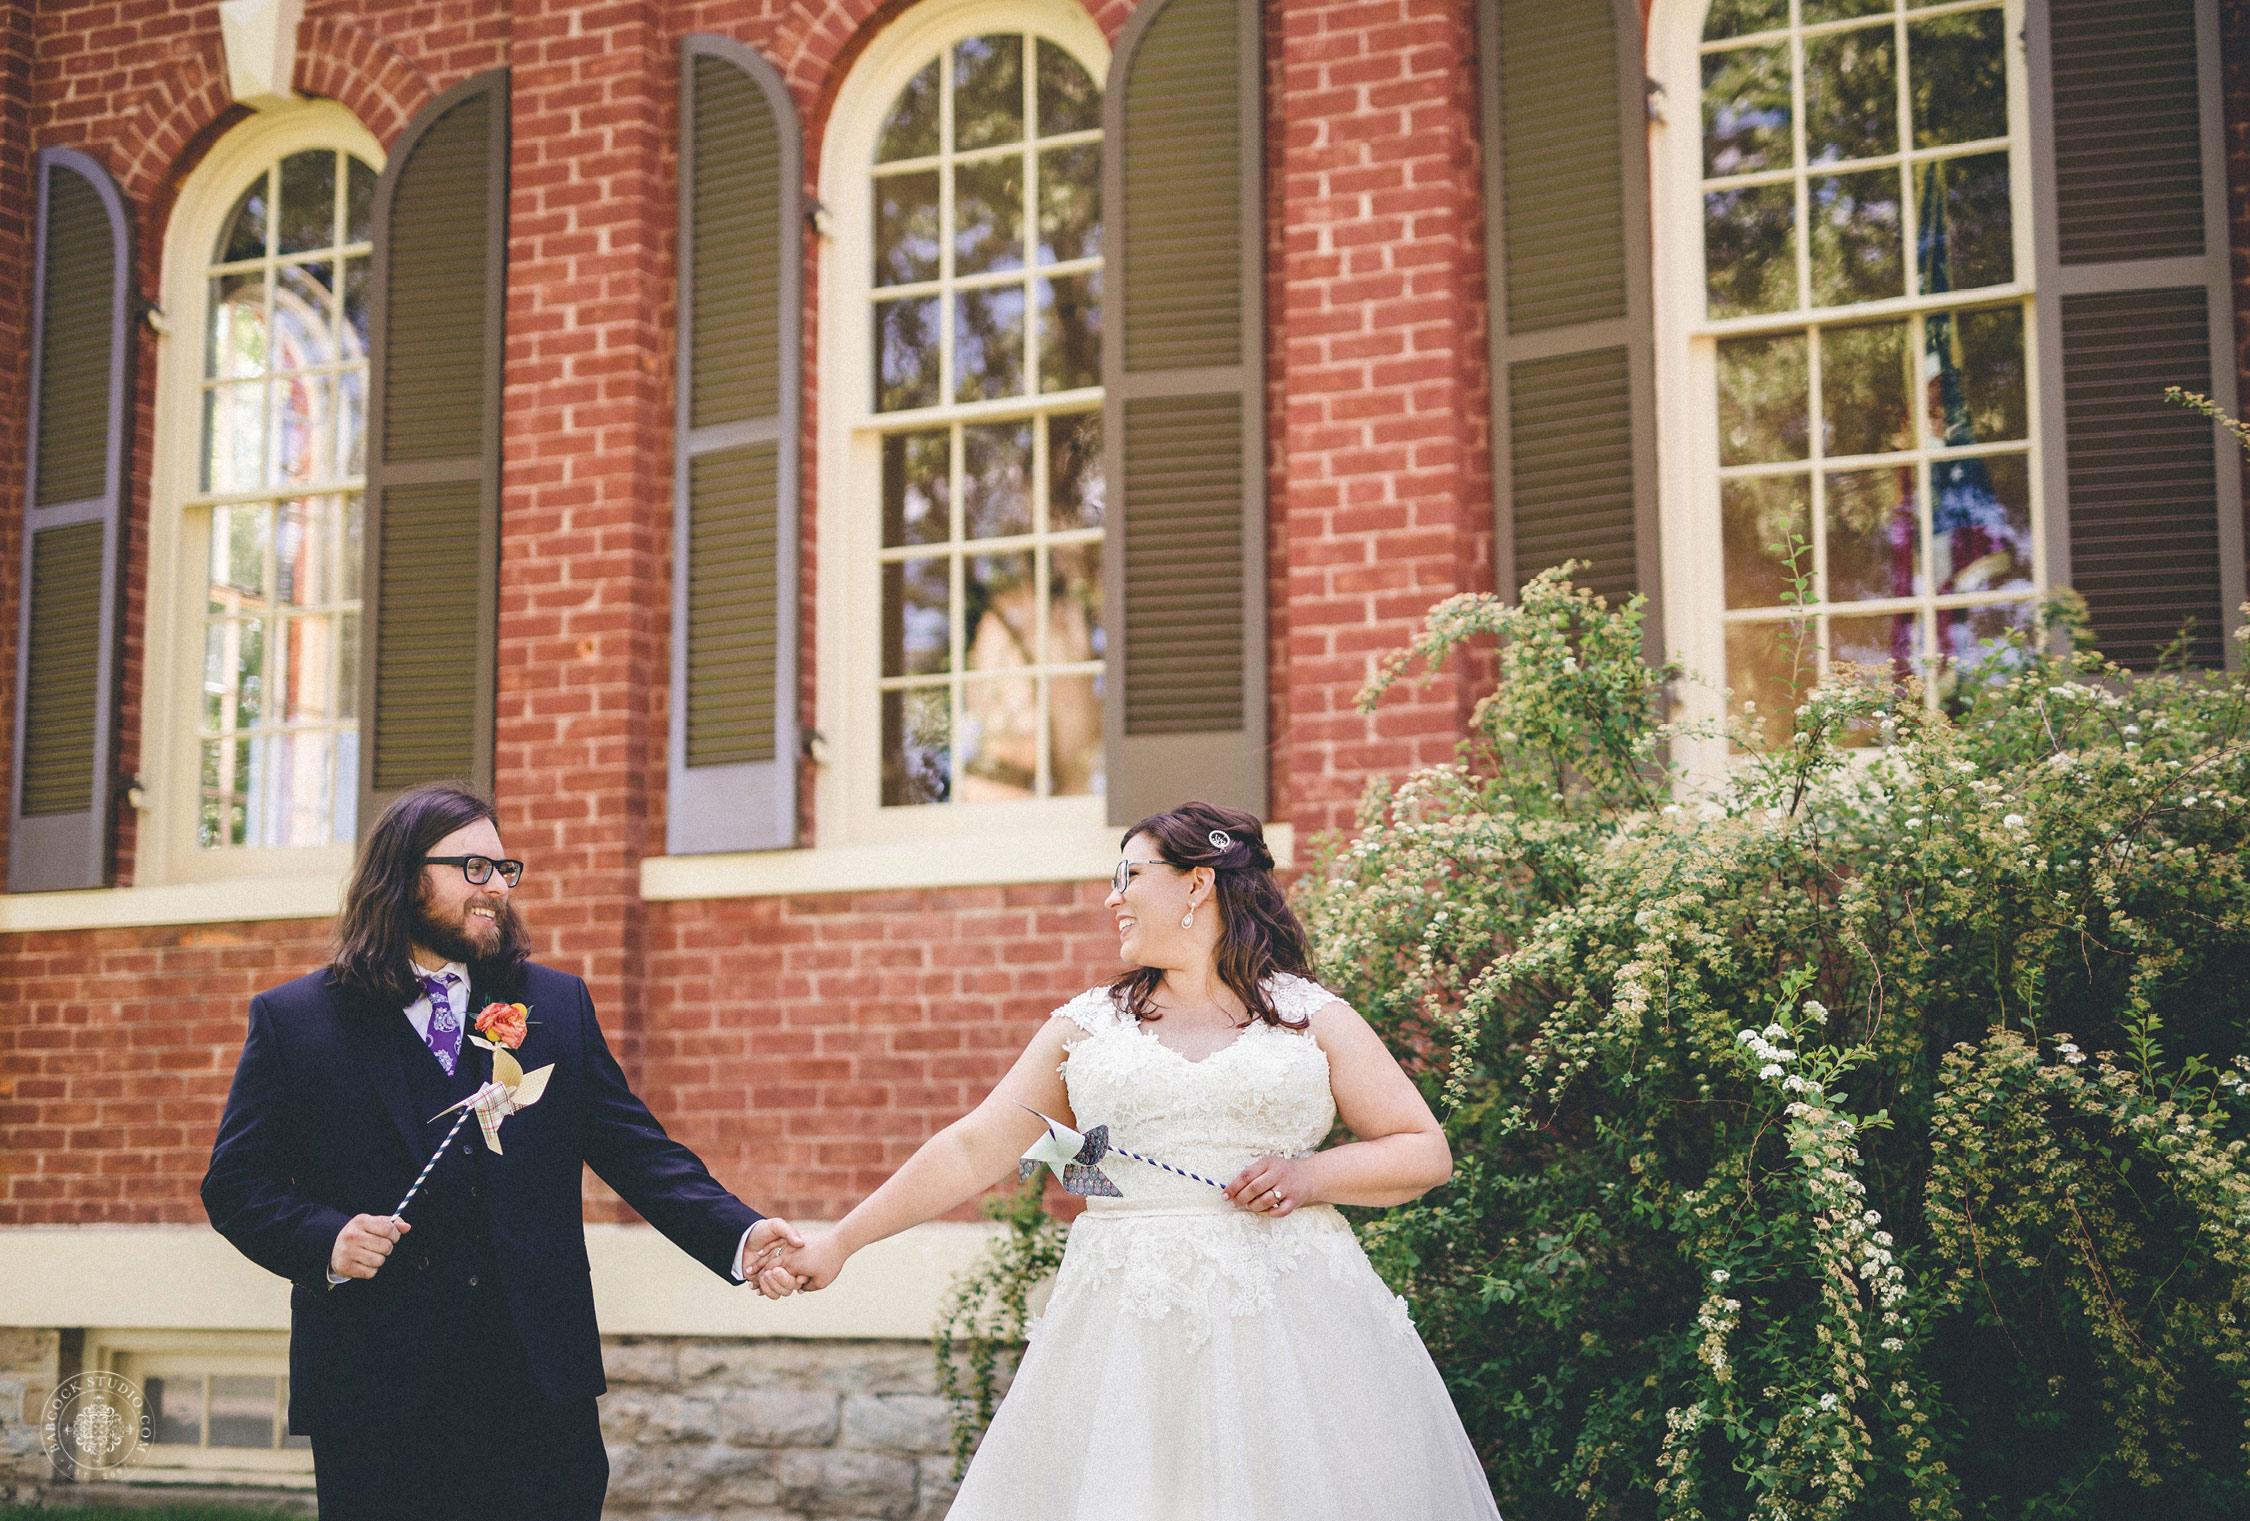 nicole-brendarn-school-house-wedding-photographer-dayton-ohio-8.jpg